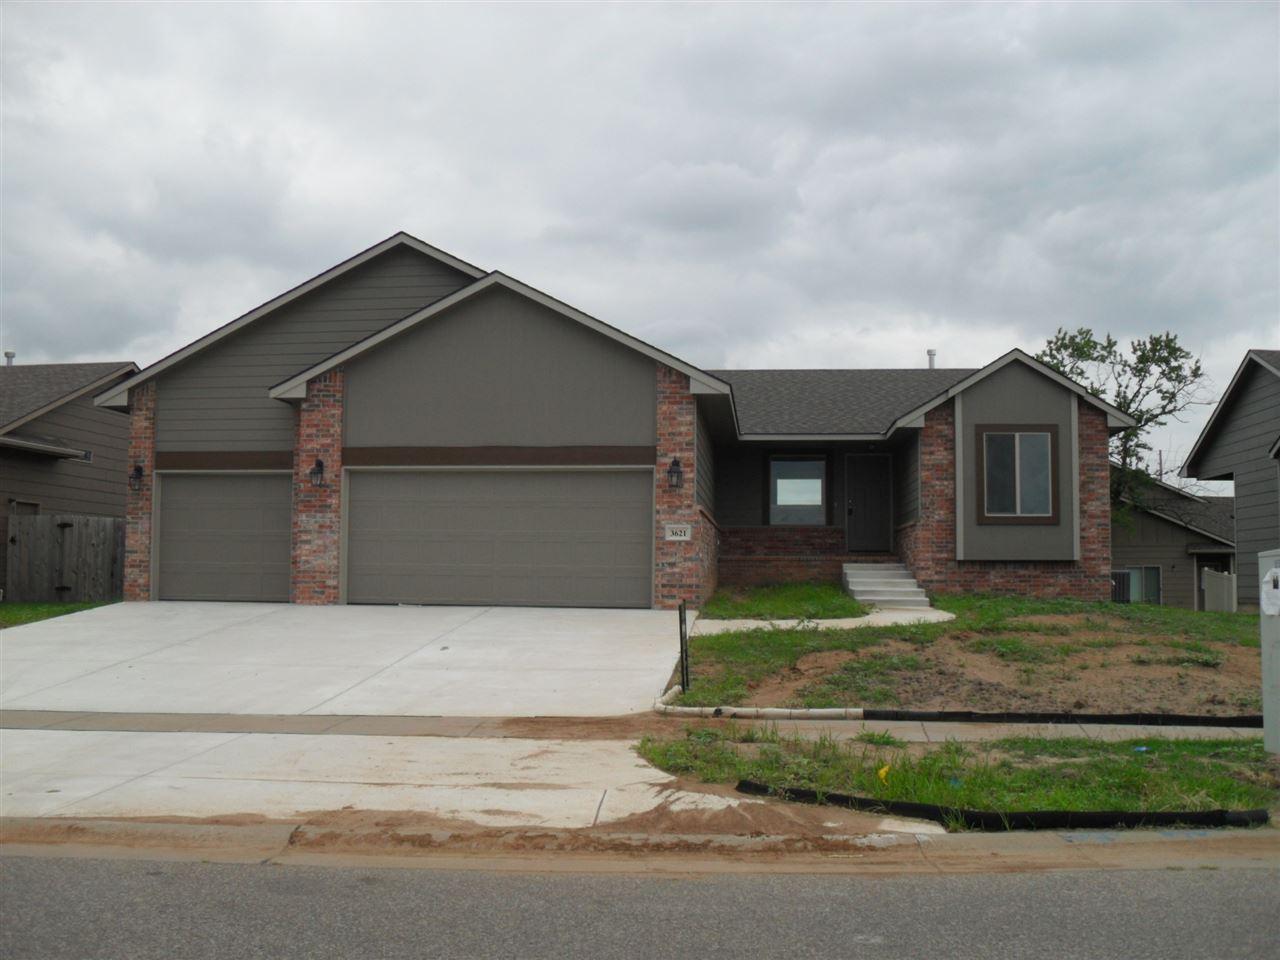 3621 N High Point, Wichita, KS 67205